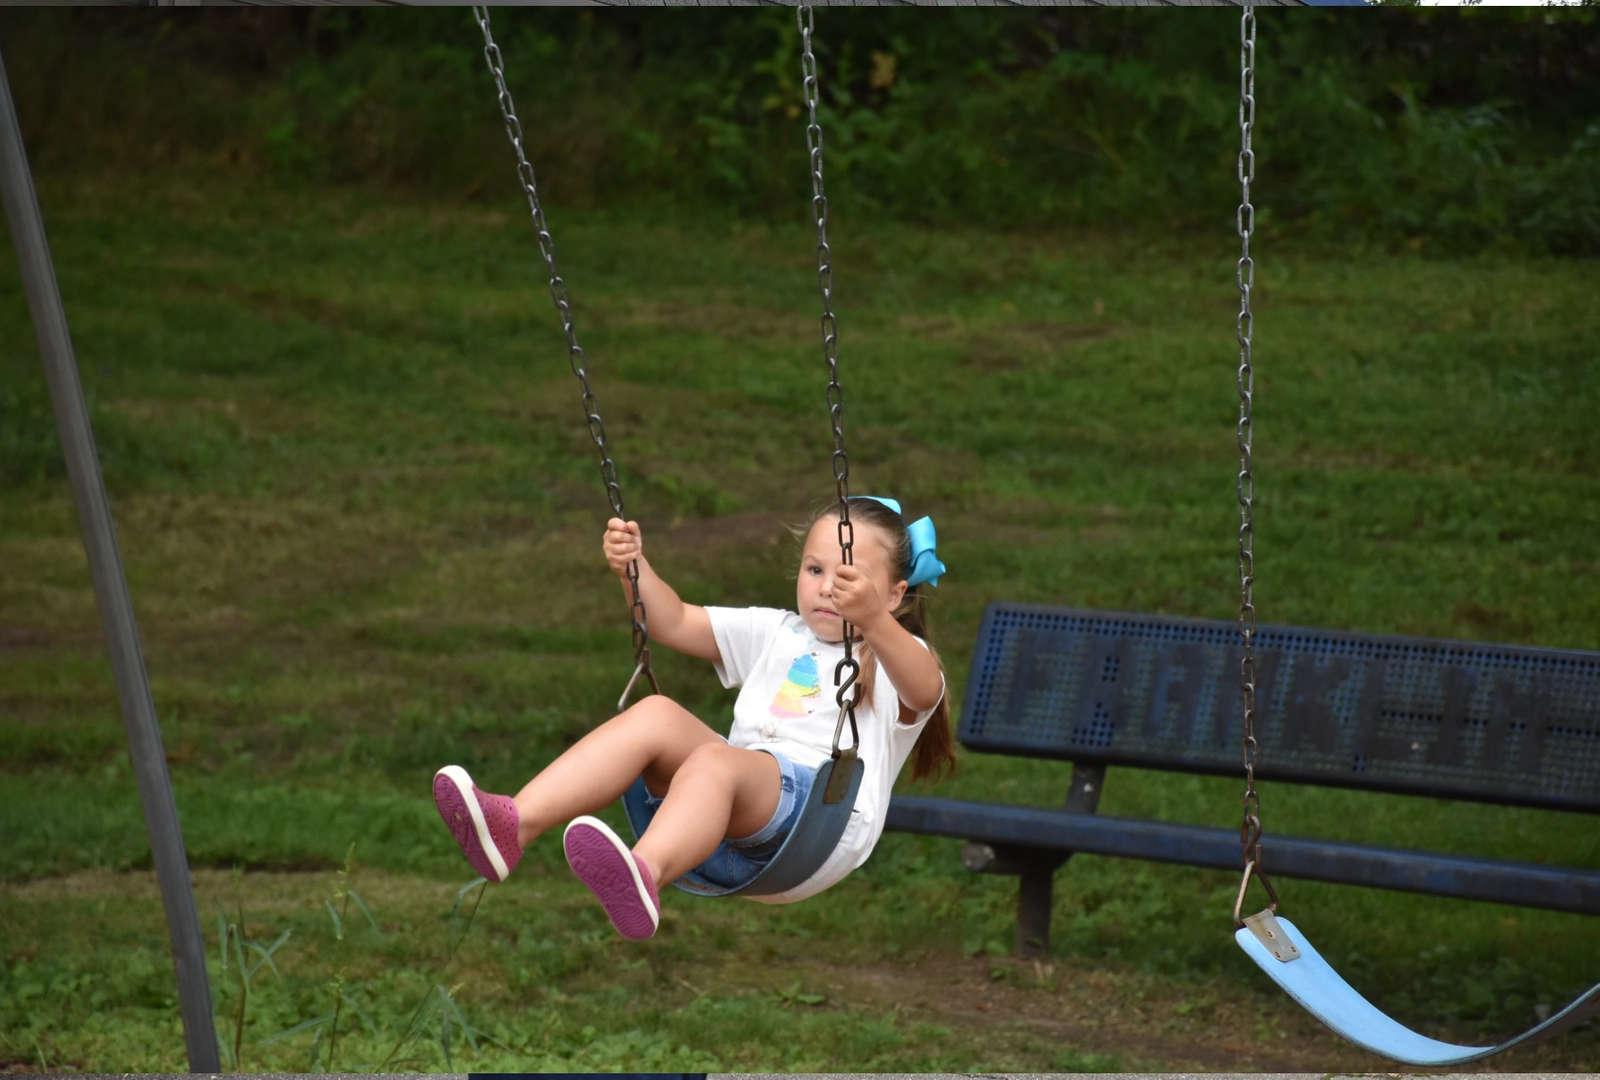 Student on playground